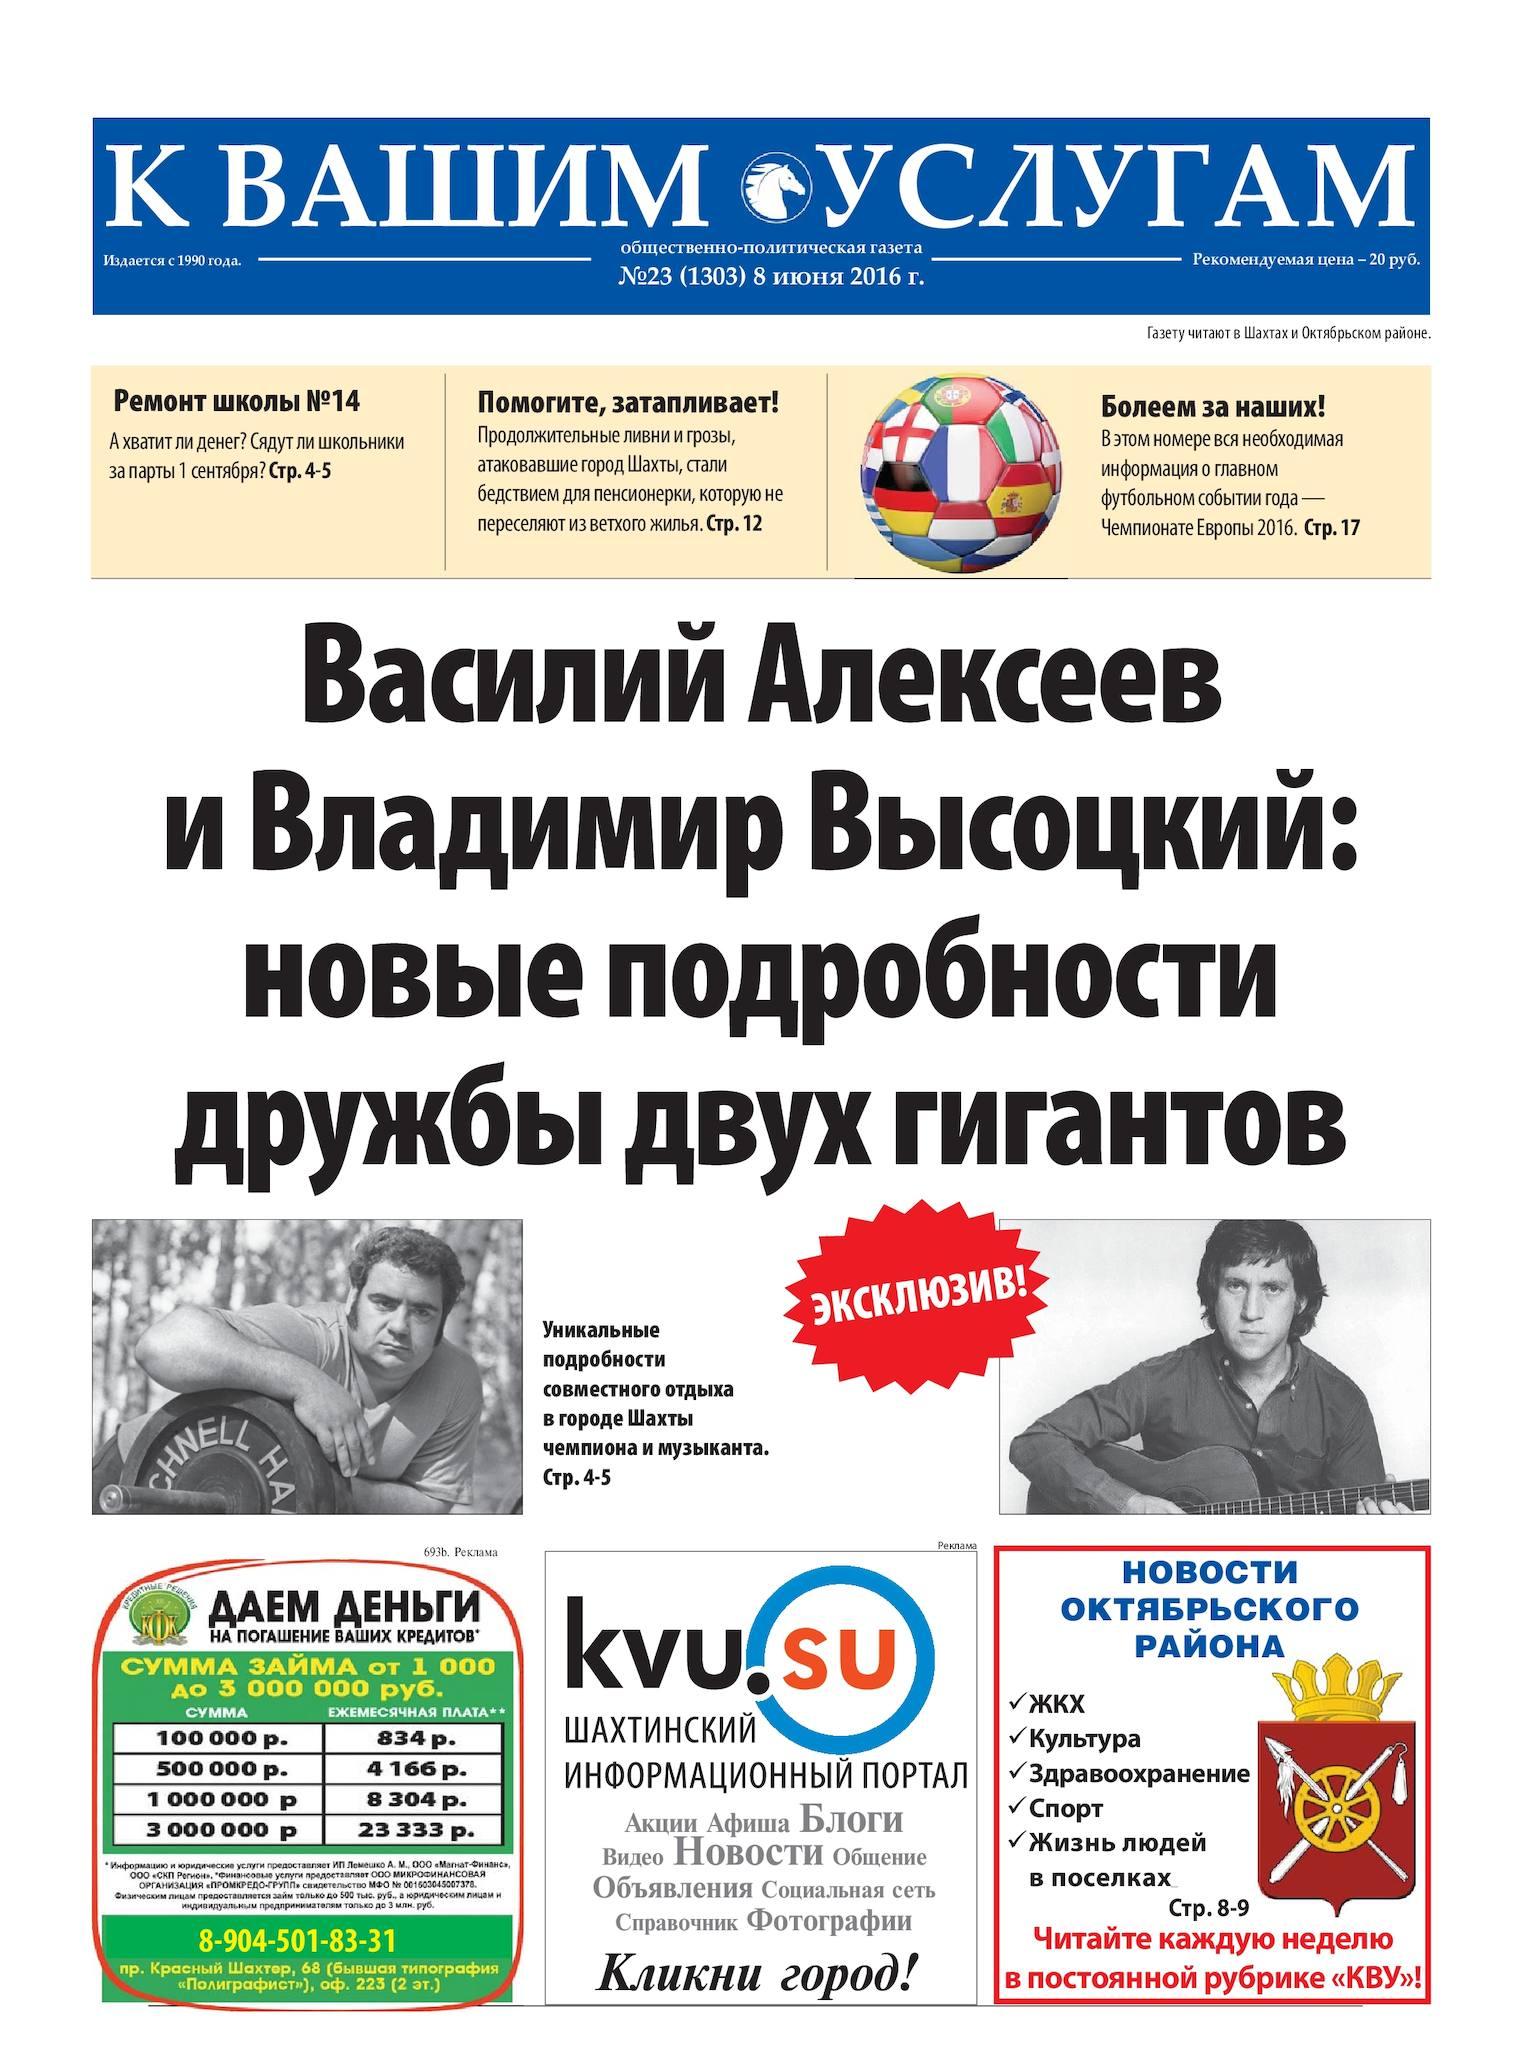 Calaméo - Газета КВУ №23 от 8 июня 2016 г. 33d8a39ad6e